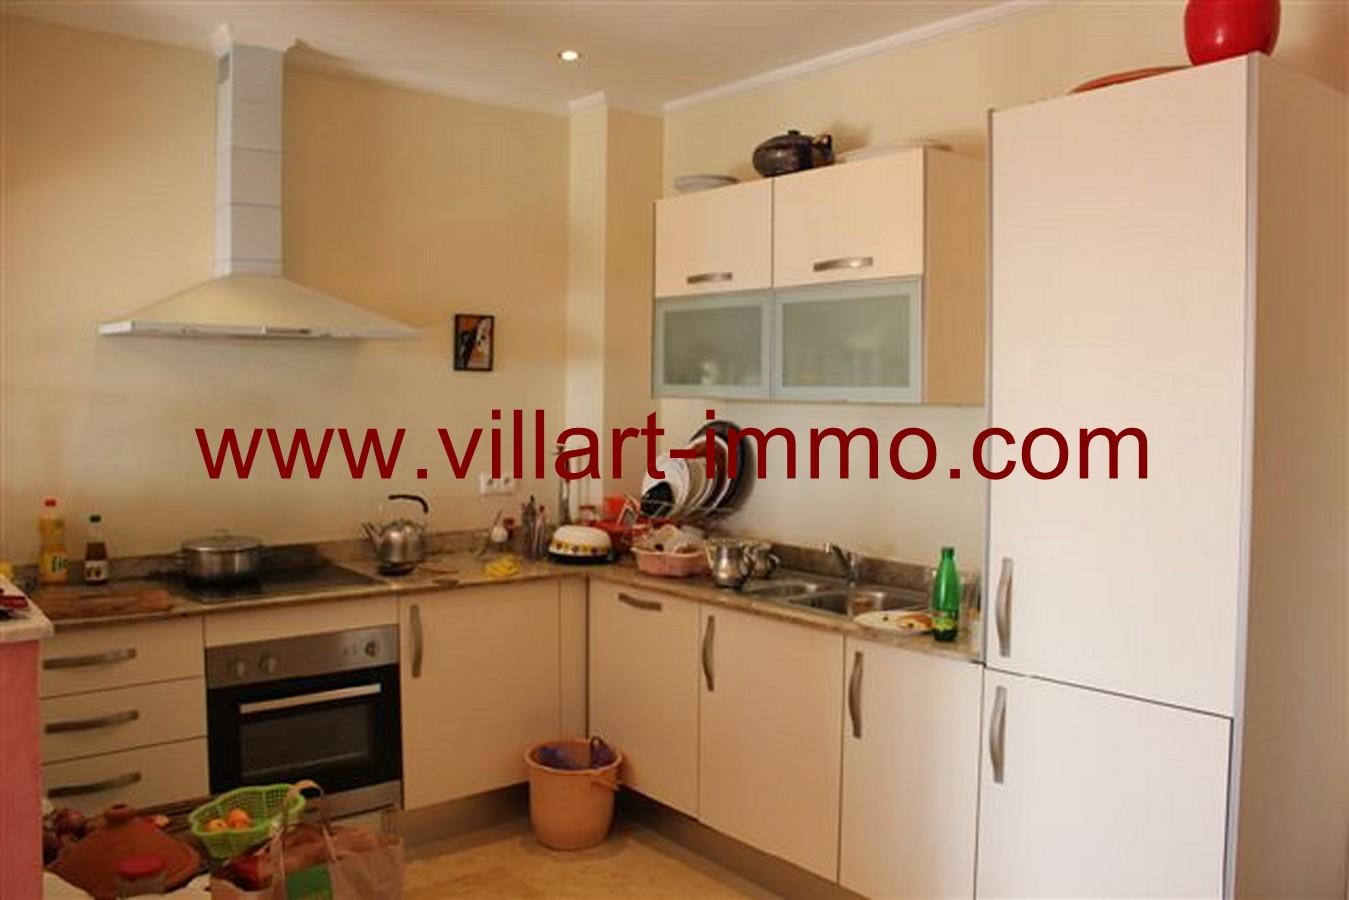 6-Vente-Appartement-Assilah-Autres-Cuisine-VA49-Villart Immo